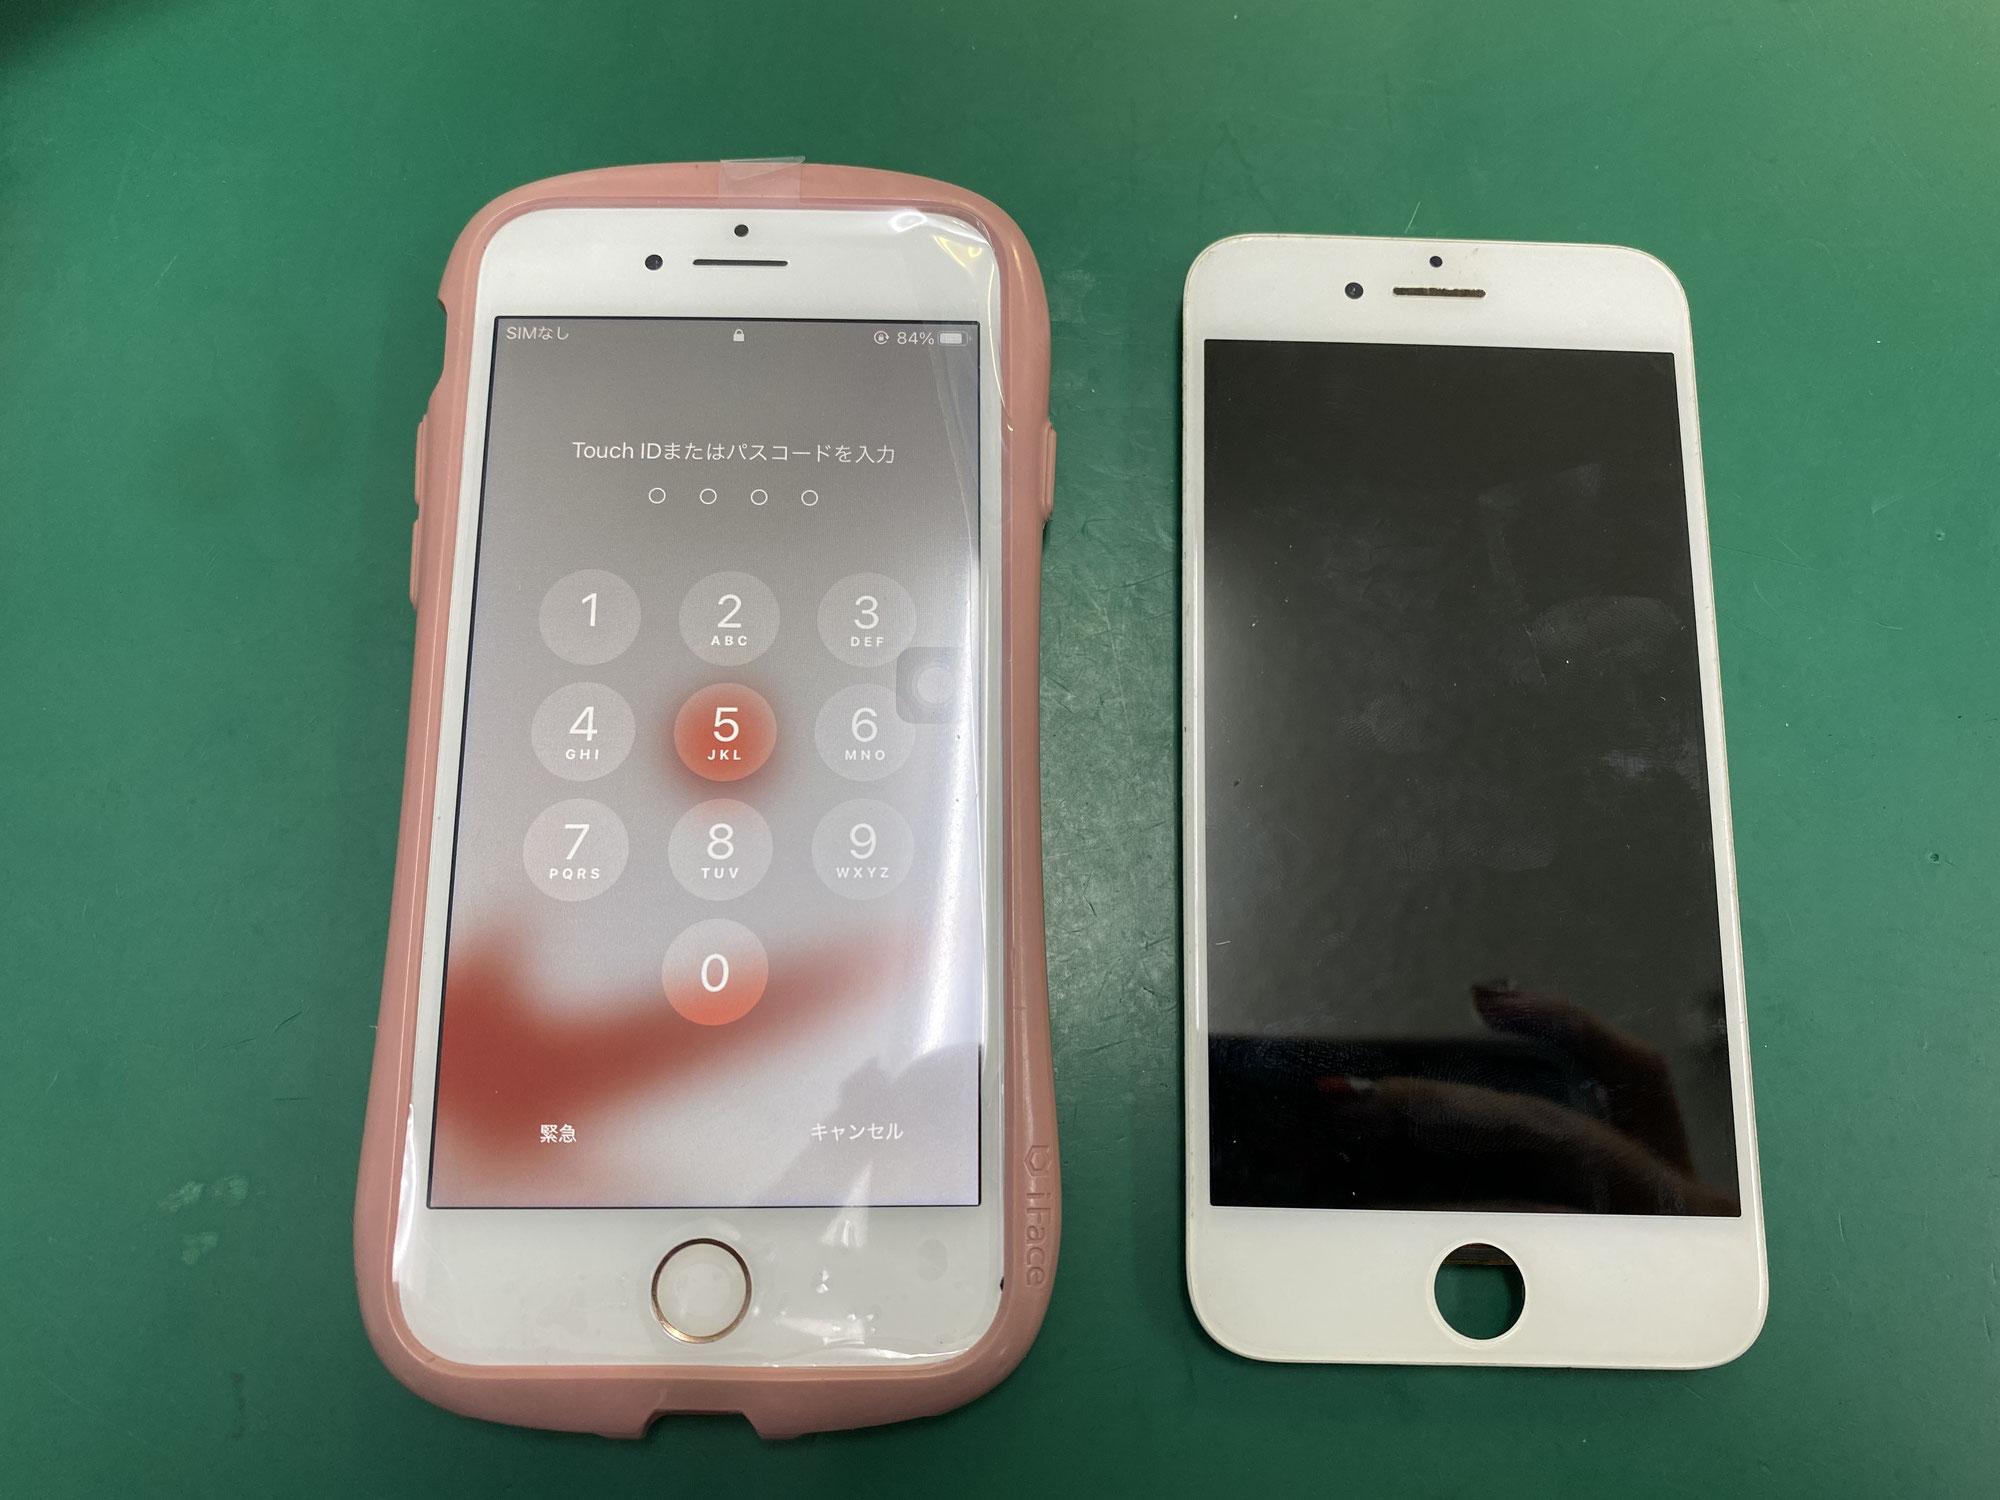 iPhone修理!防府市でもiPhone修理できますよ